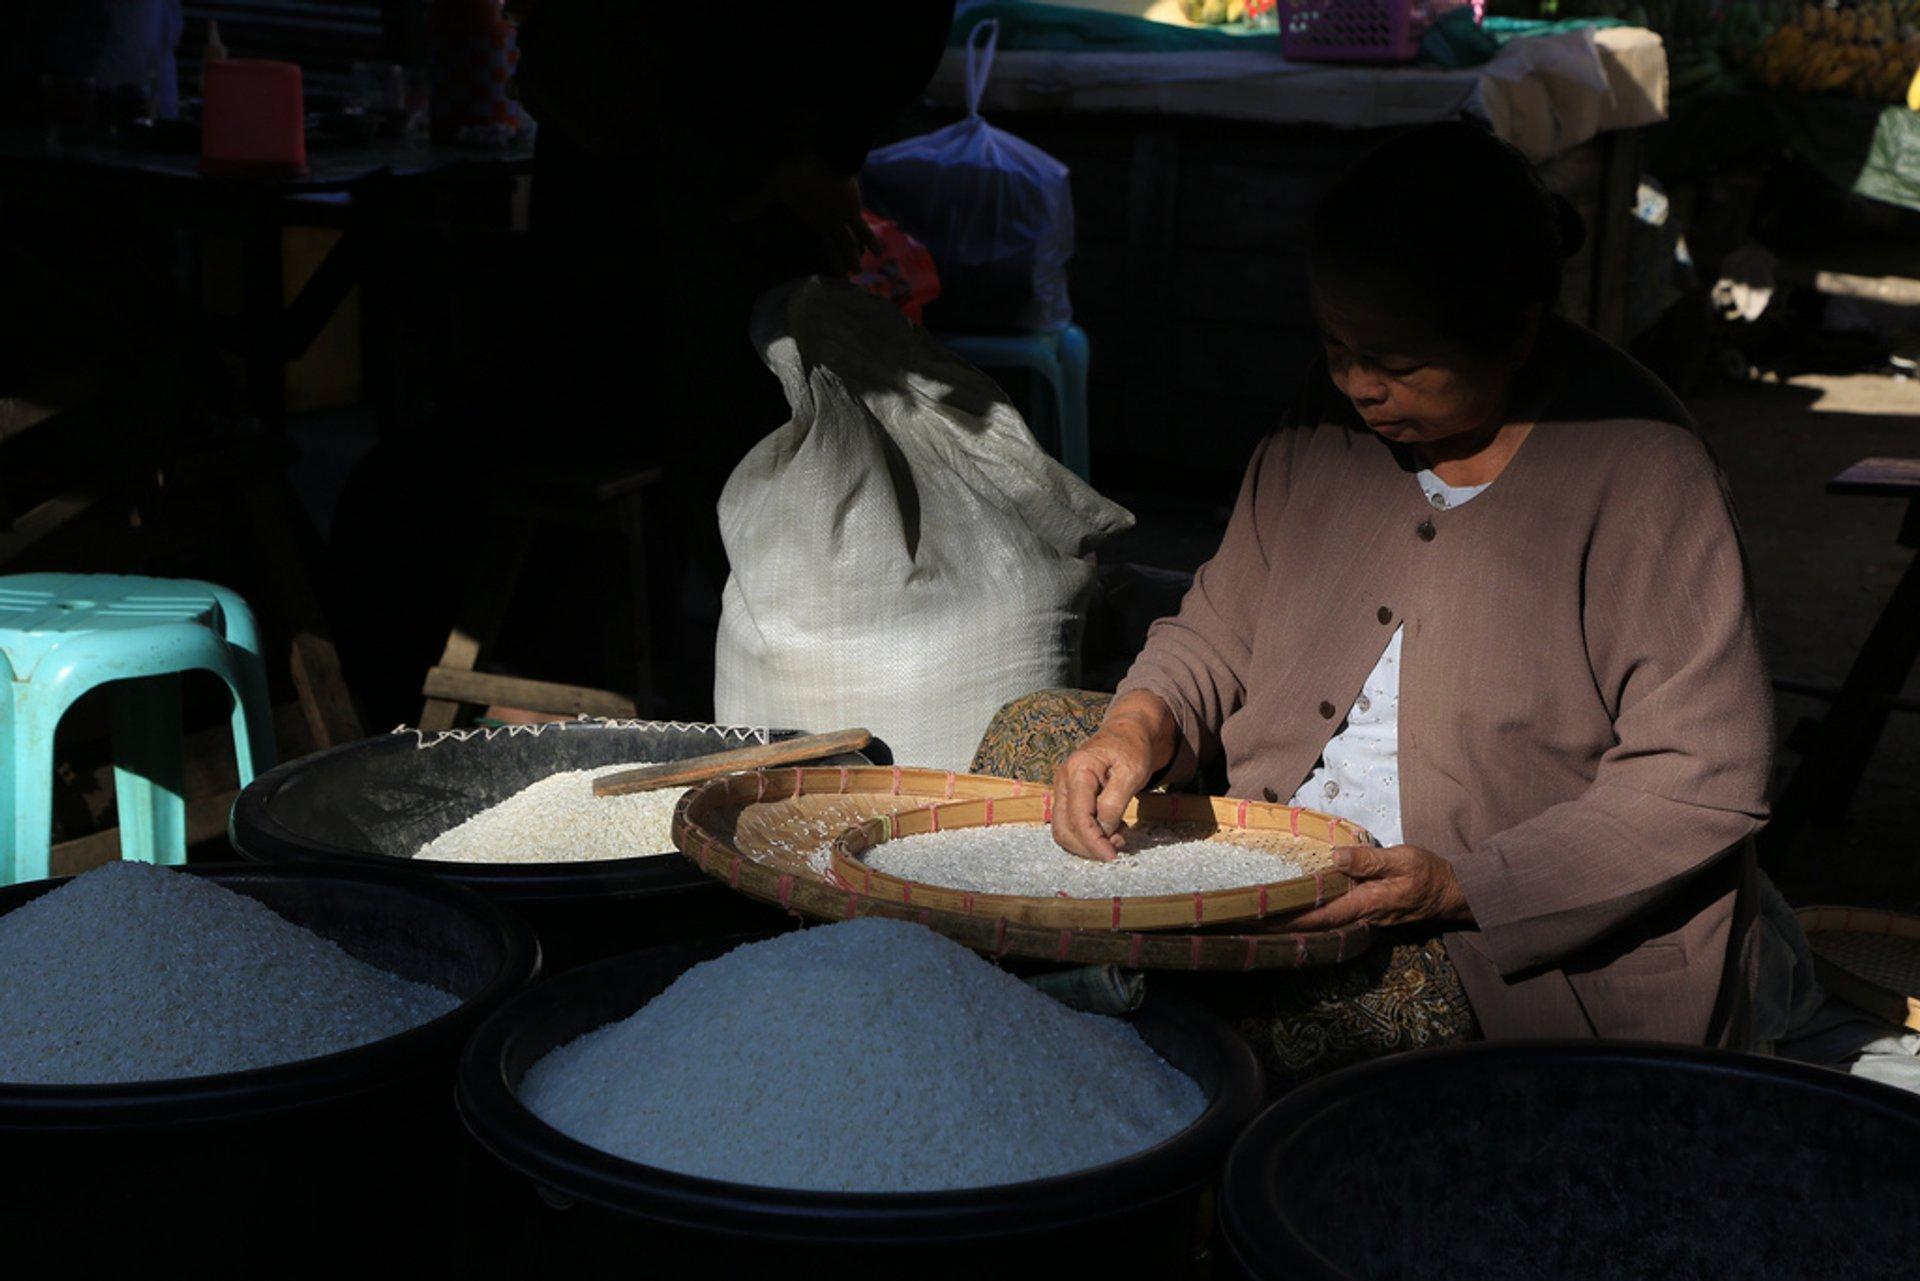 Woman trader sorting rice at Keng Tong Market in Myanmar (Burma) 2019